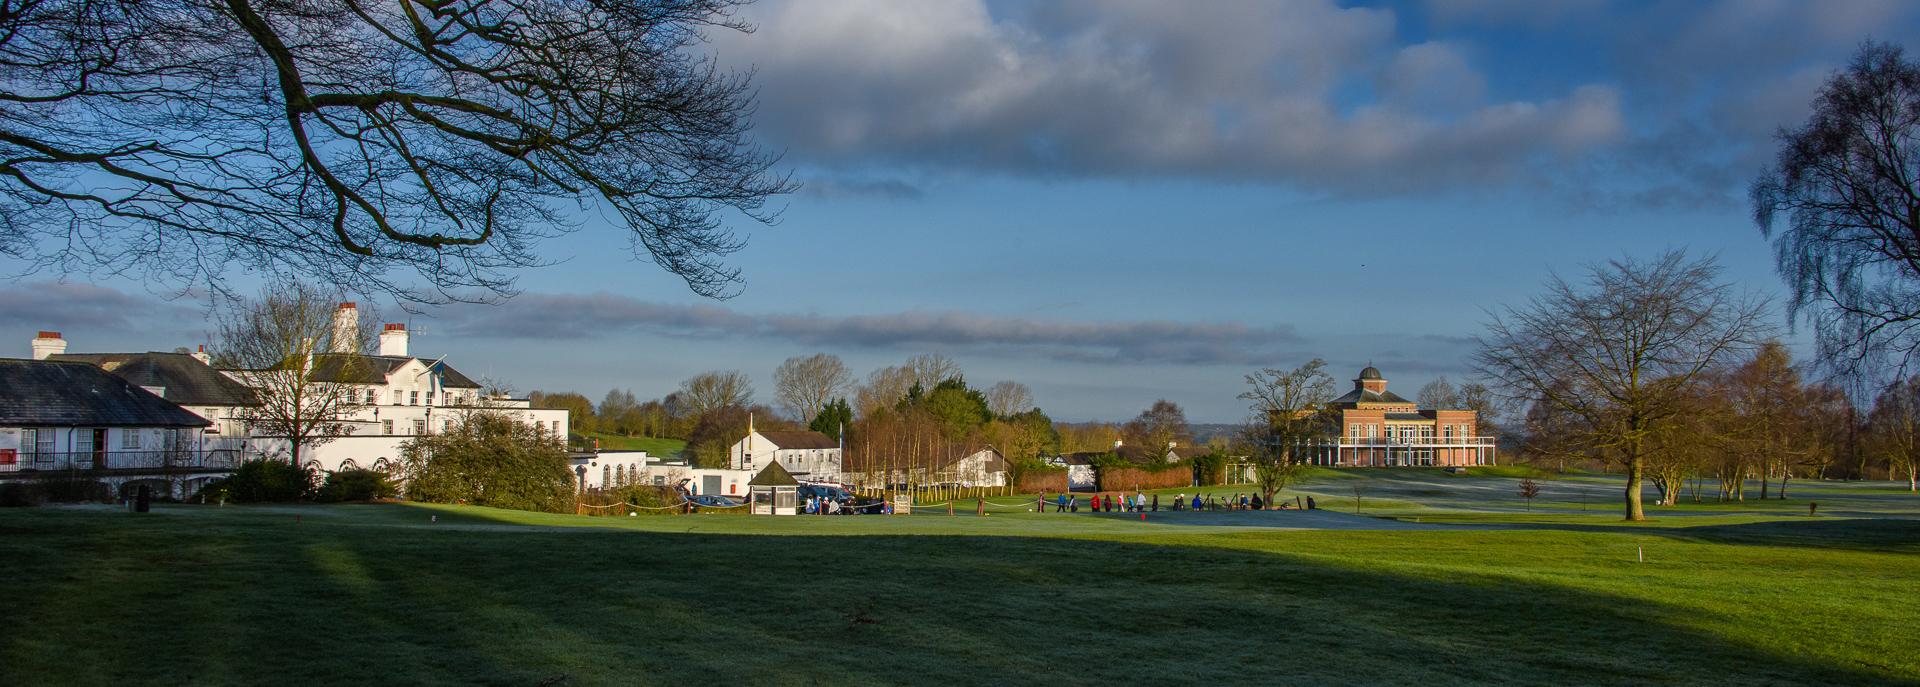 Kevindiss.com golf course photography Hawkstone Park golf course--10.jpg